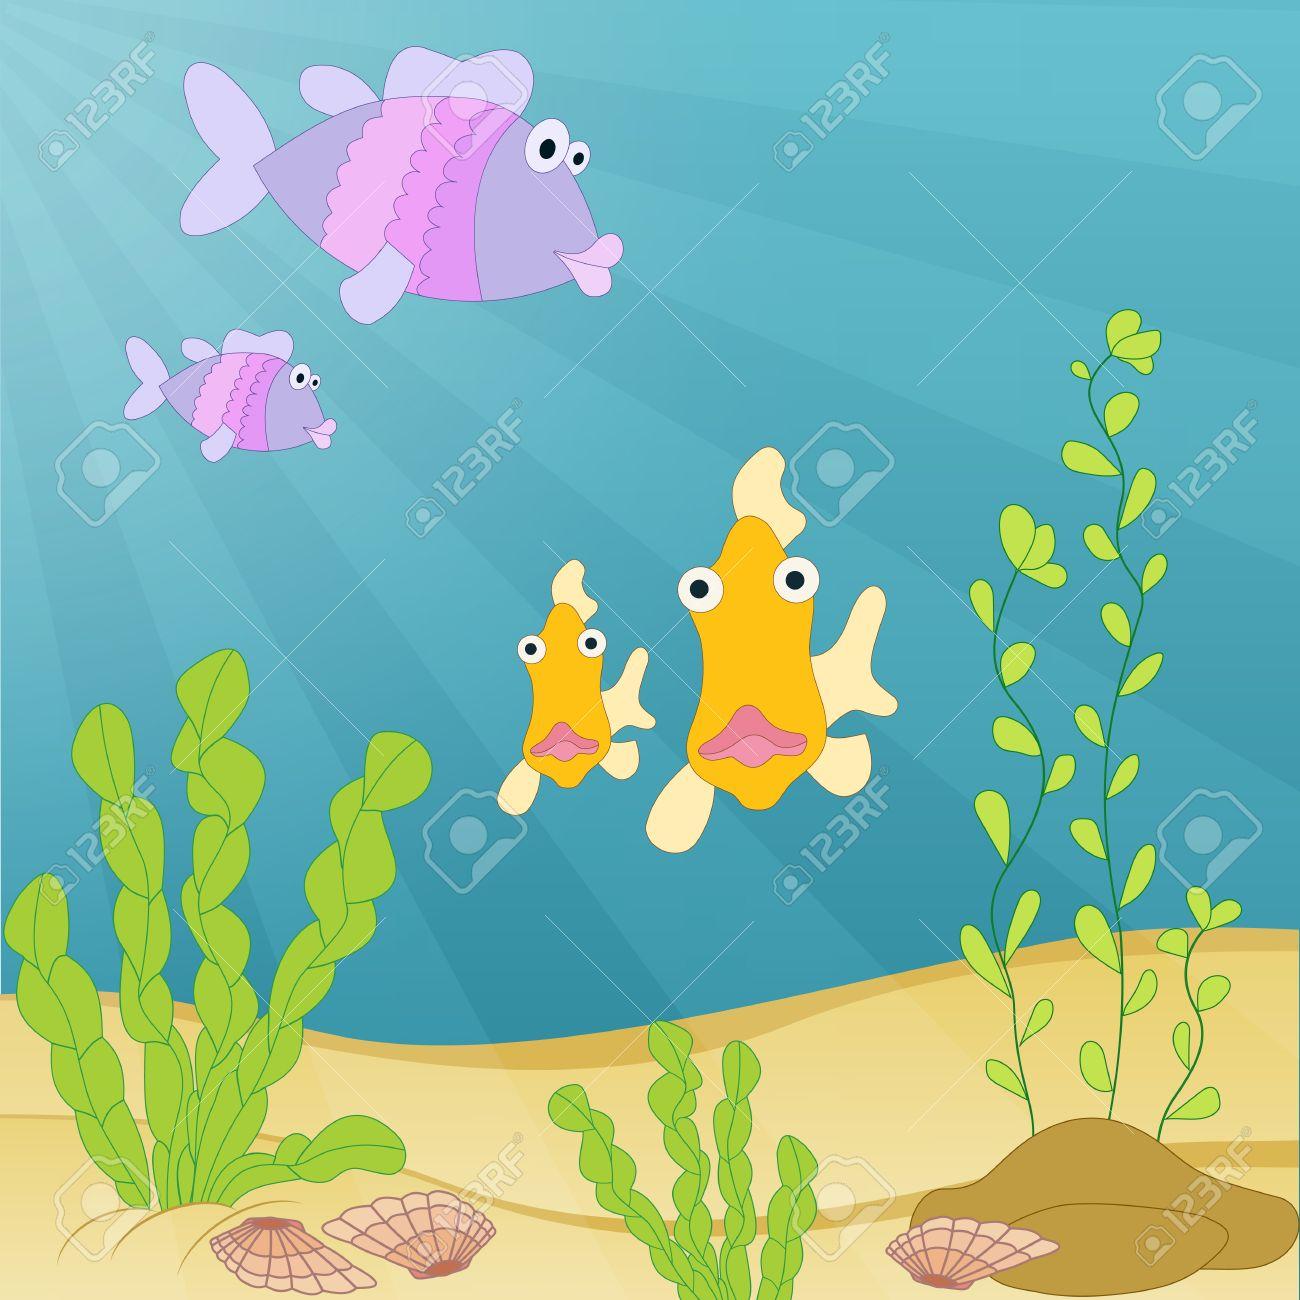 cute hand drawn cartoon illustration sea creatures under the